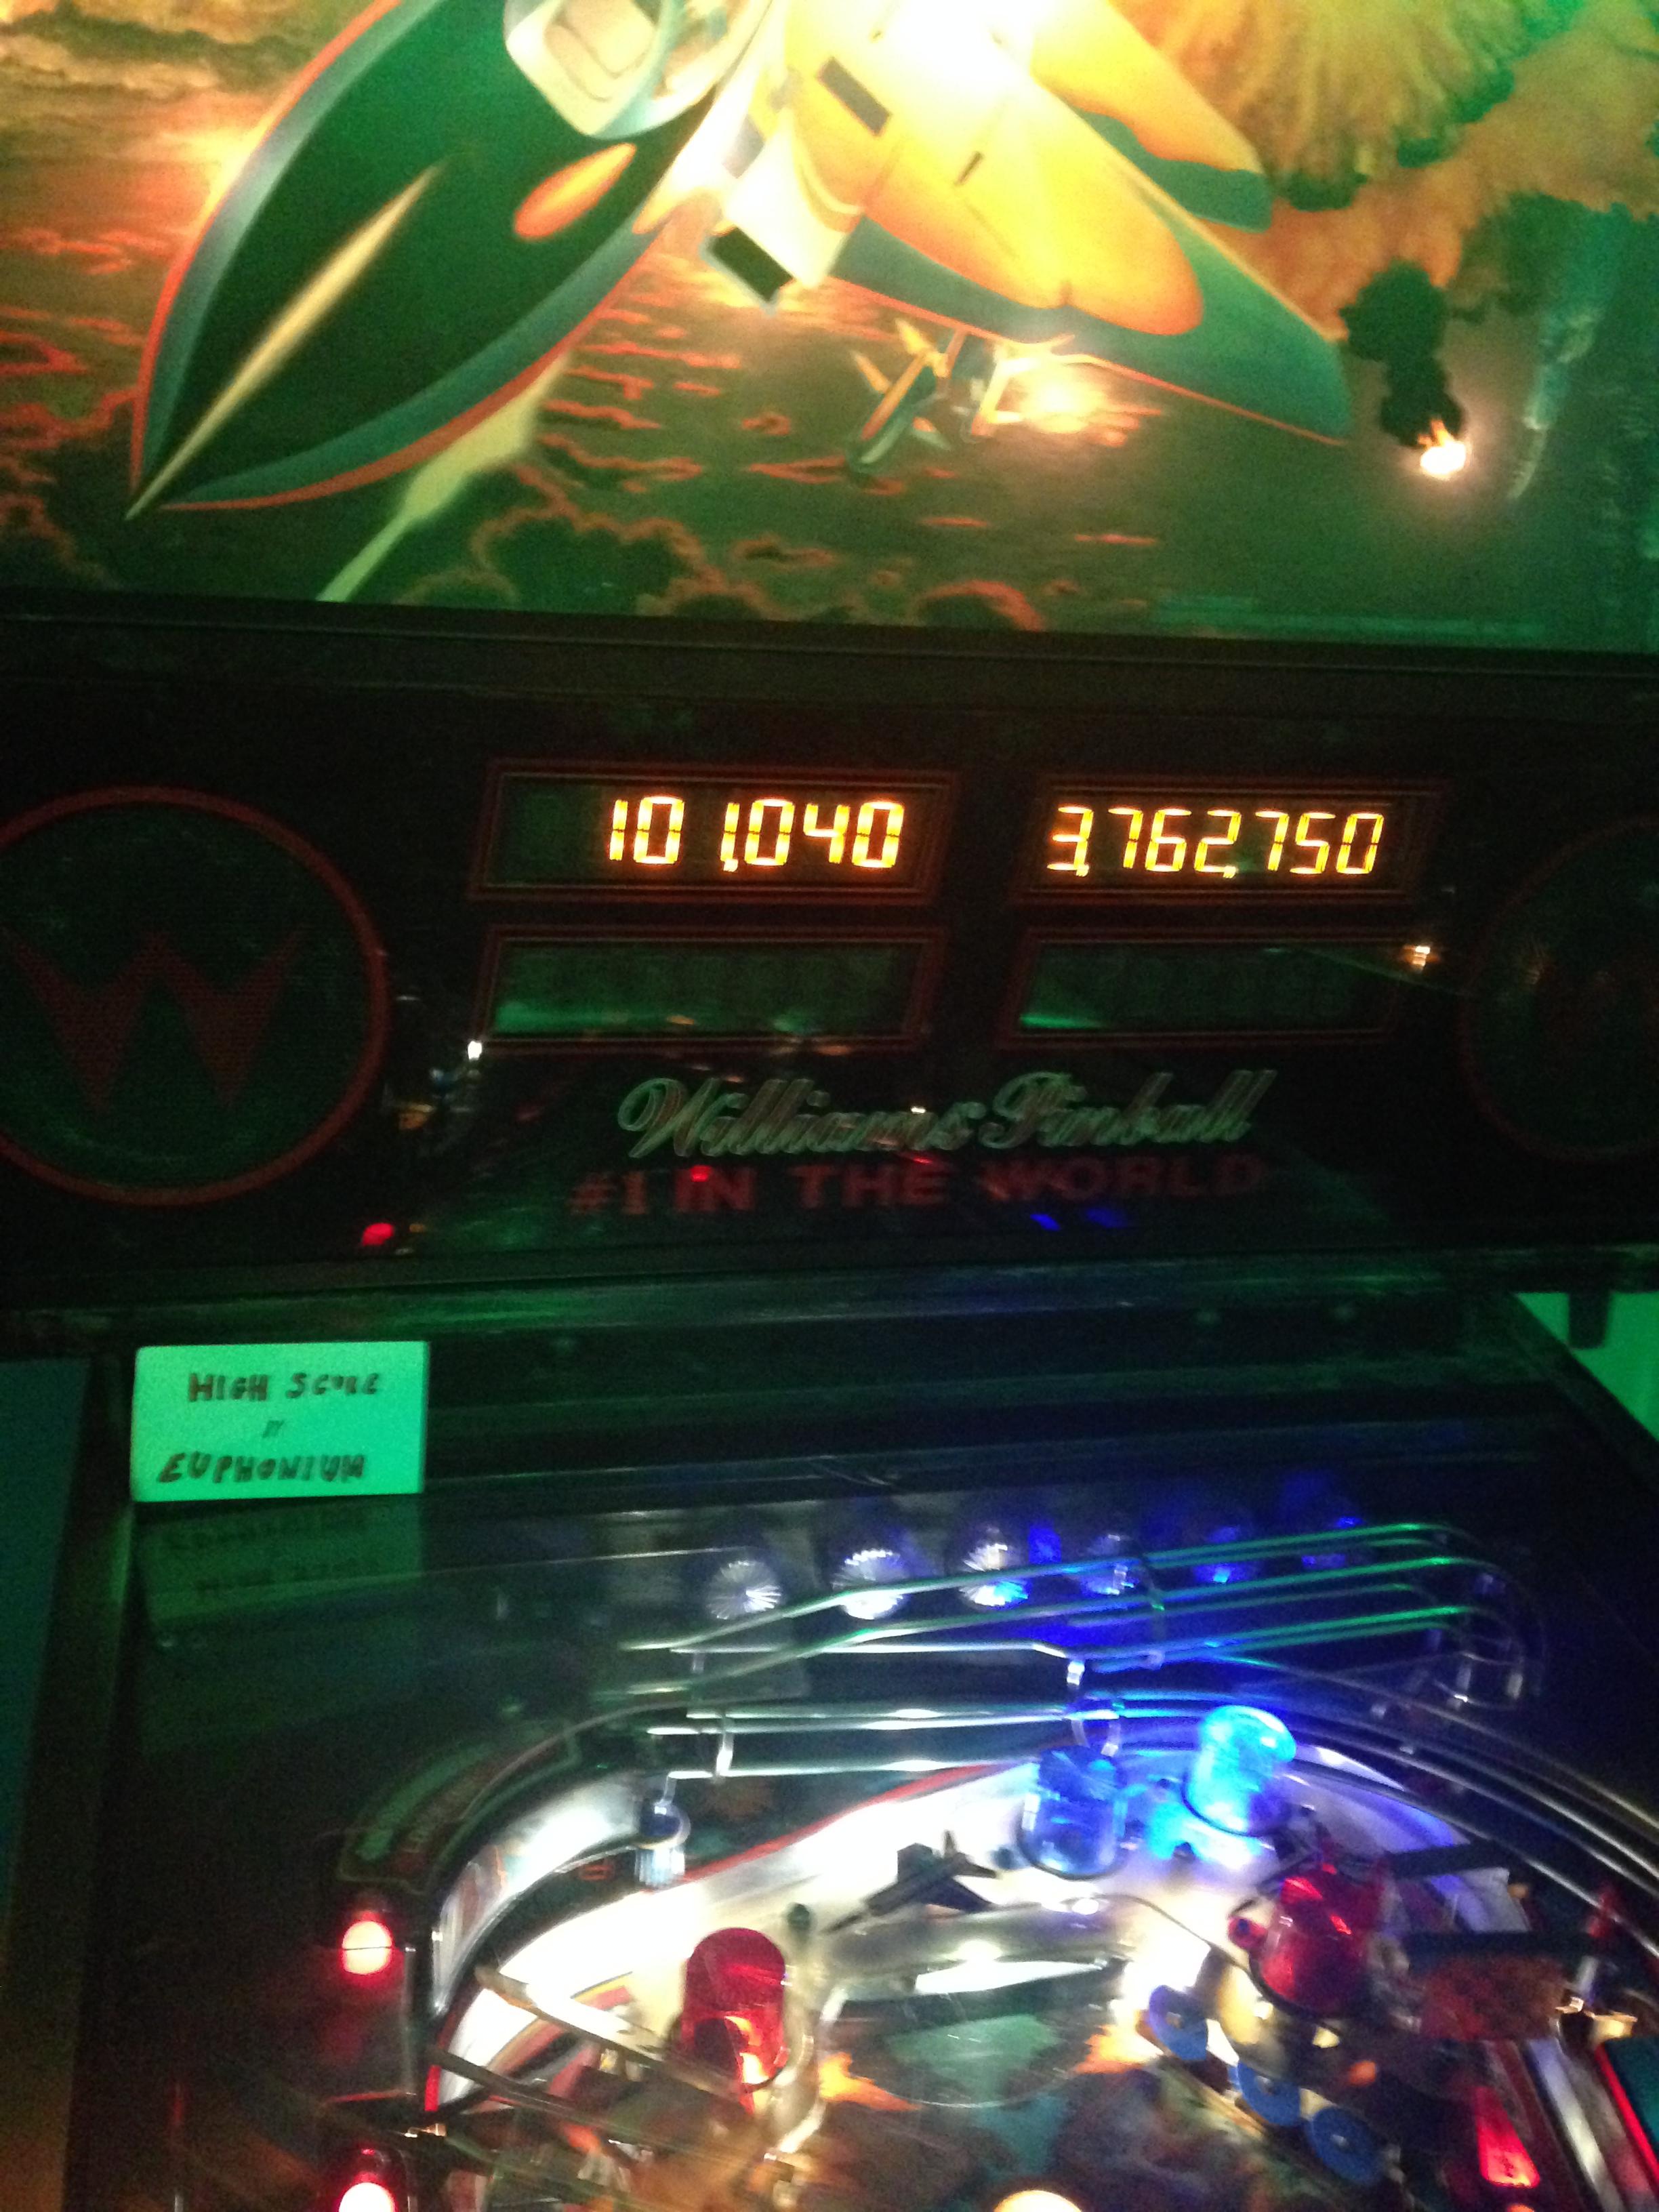 euphonium: F-14 Tomcat (Pinball: 3 Balls) 3,762,750 points on 2017-04-13 23:06:50